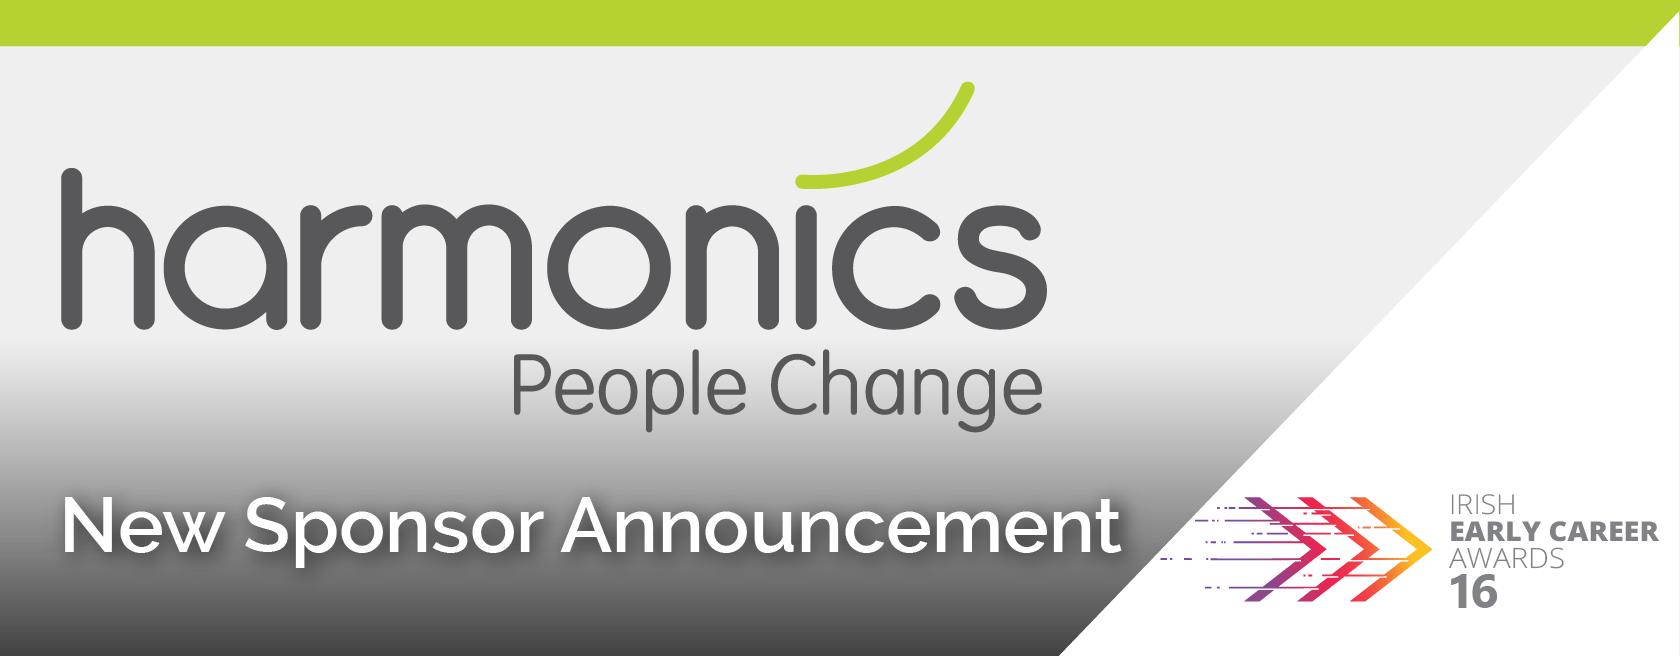 Harmonics New Sponsor